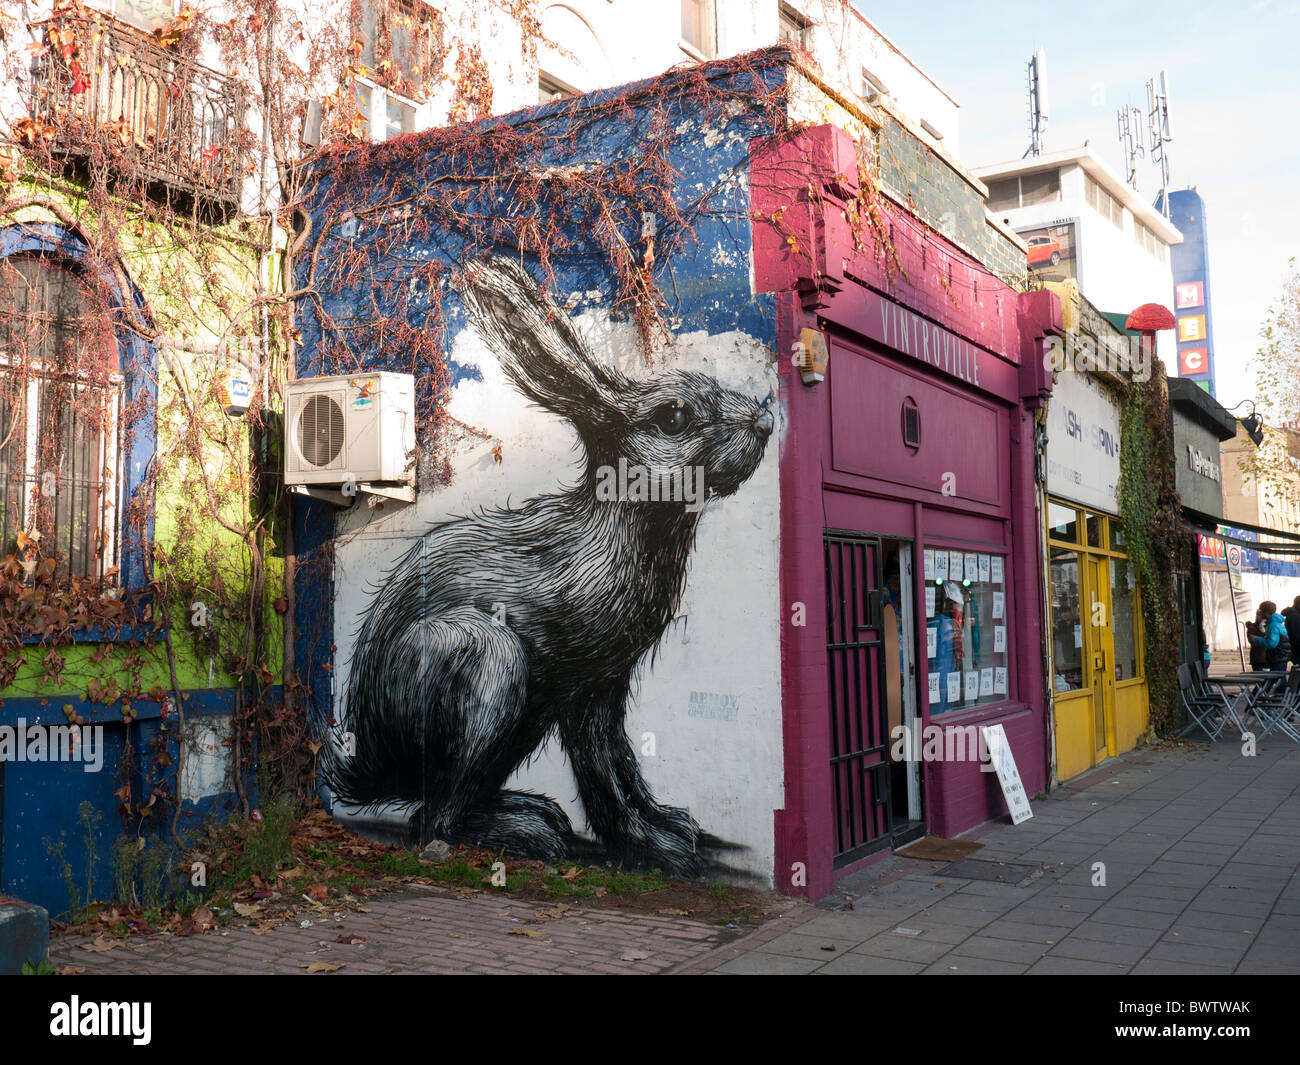 White Rabbit Cafe Berlin